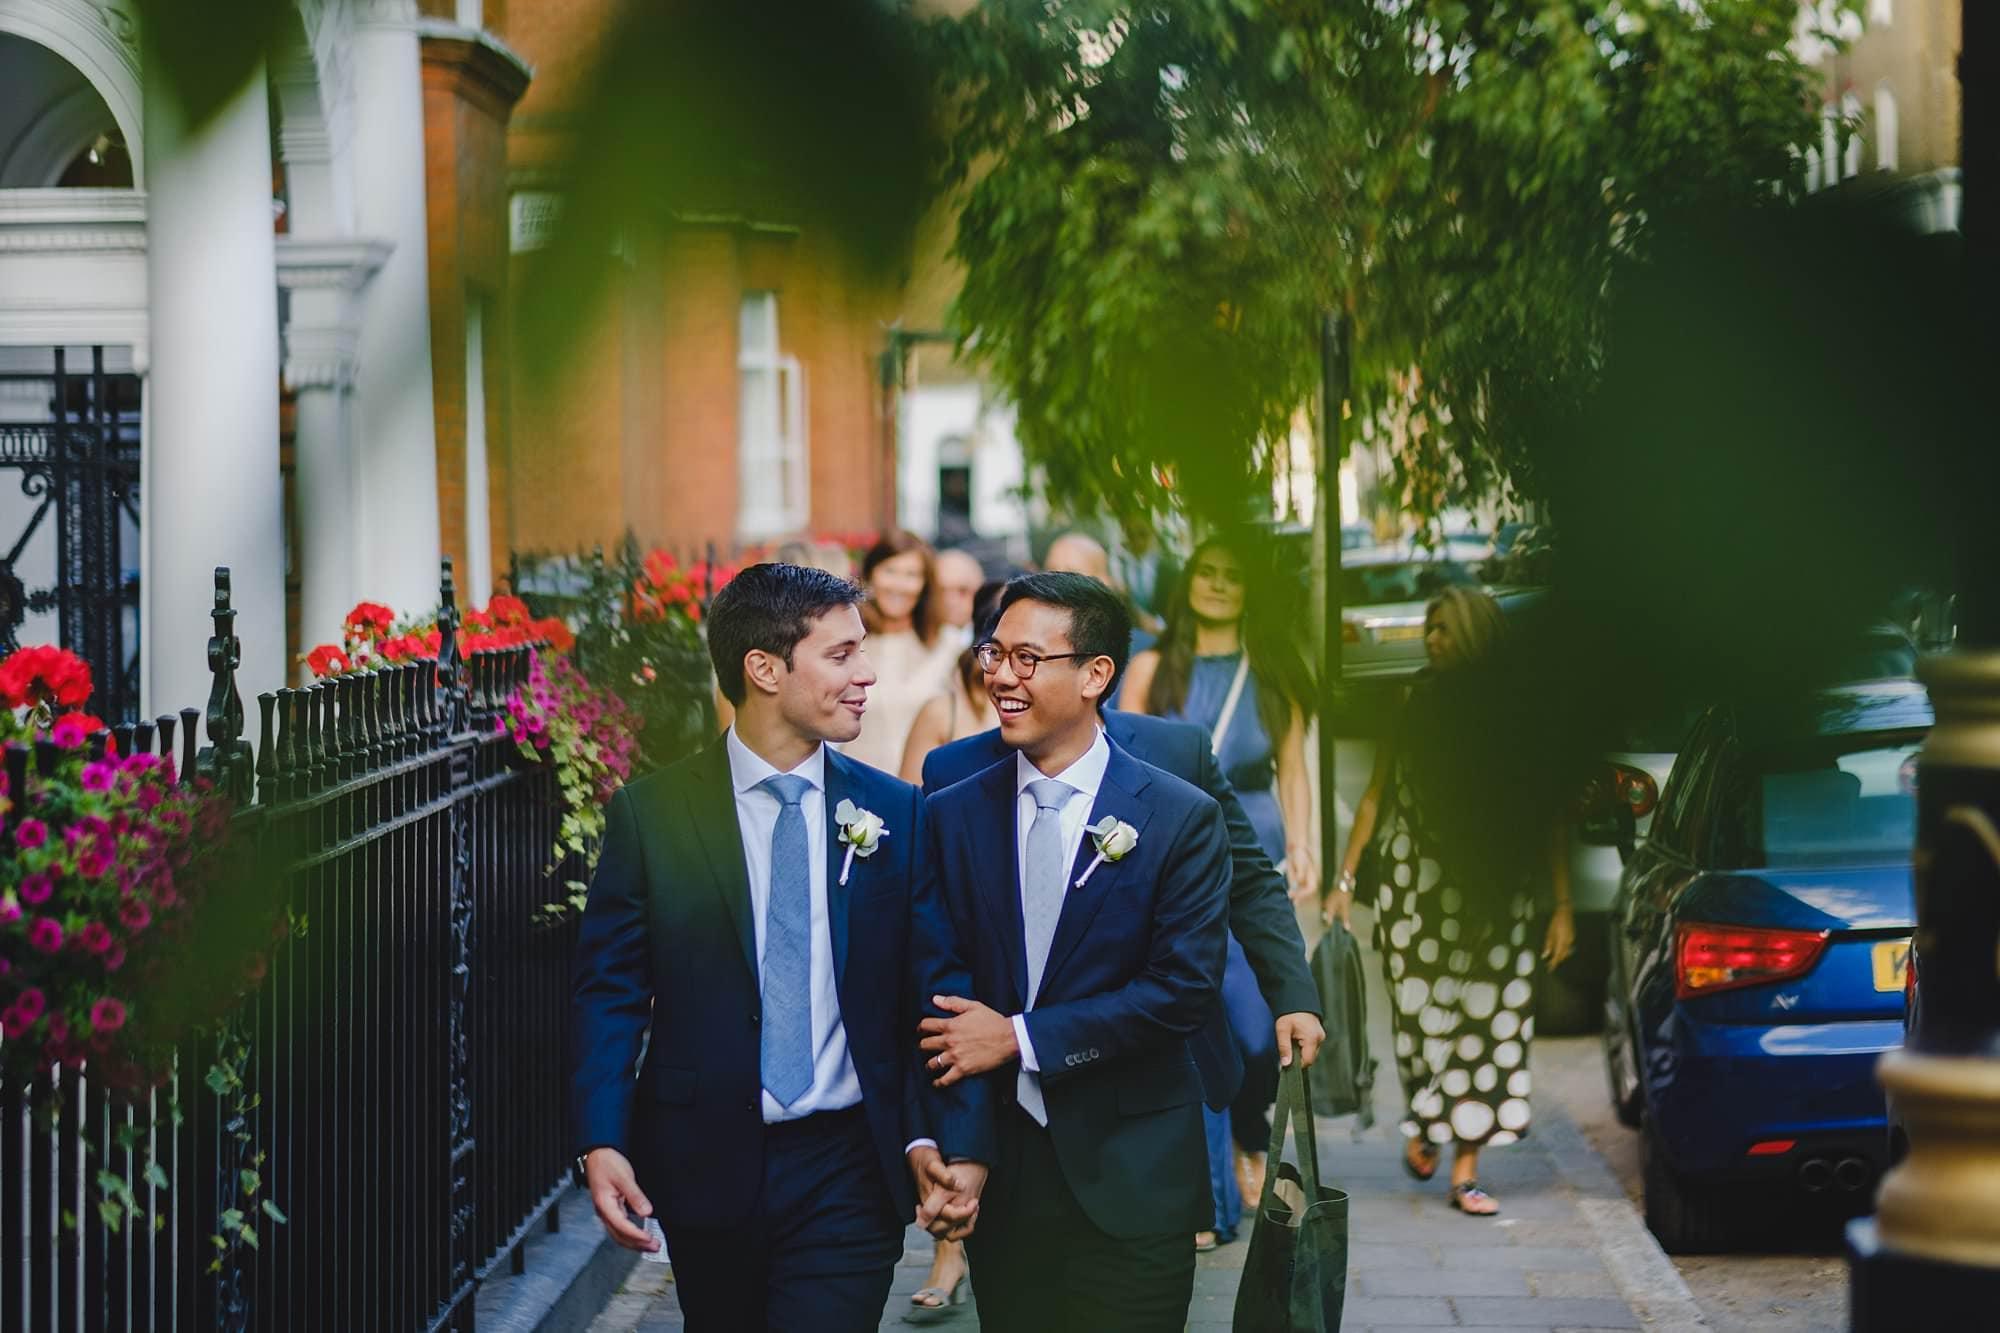 old marylebone town hall wedding photographer wedding jh 034 - Hugo + Josh   Marylebone